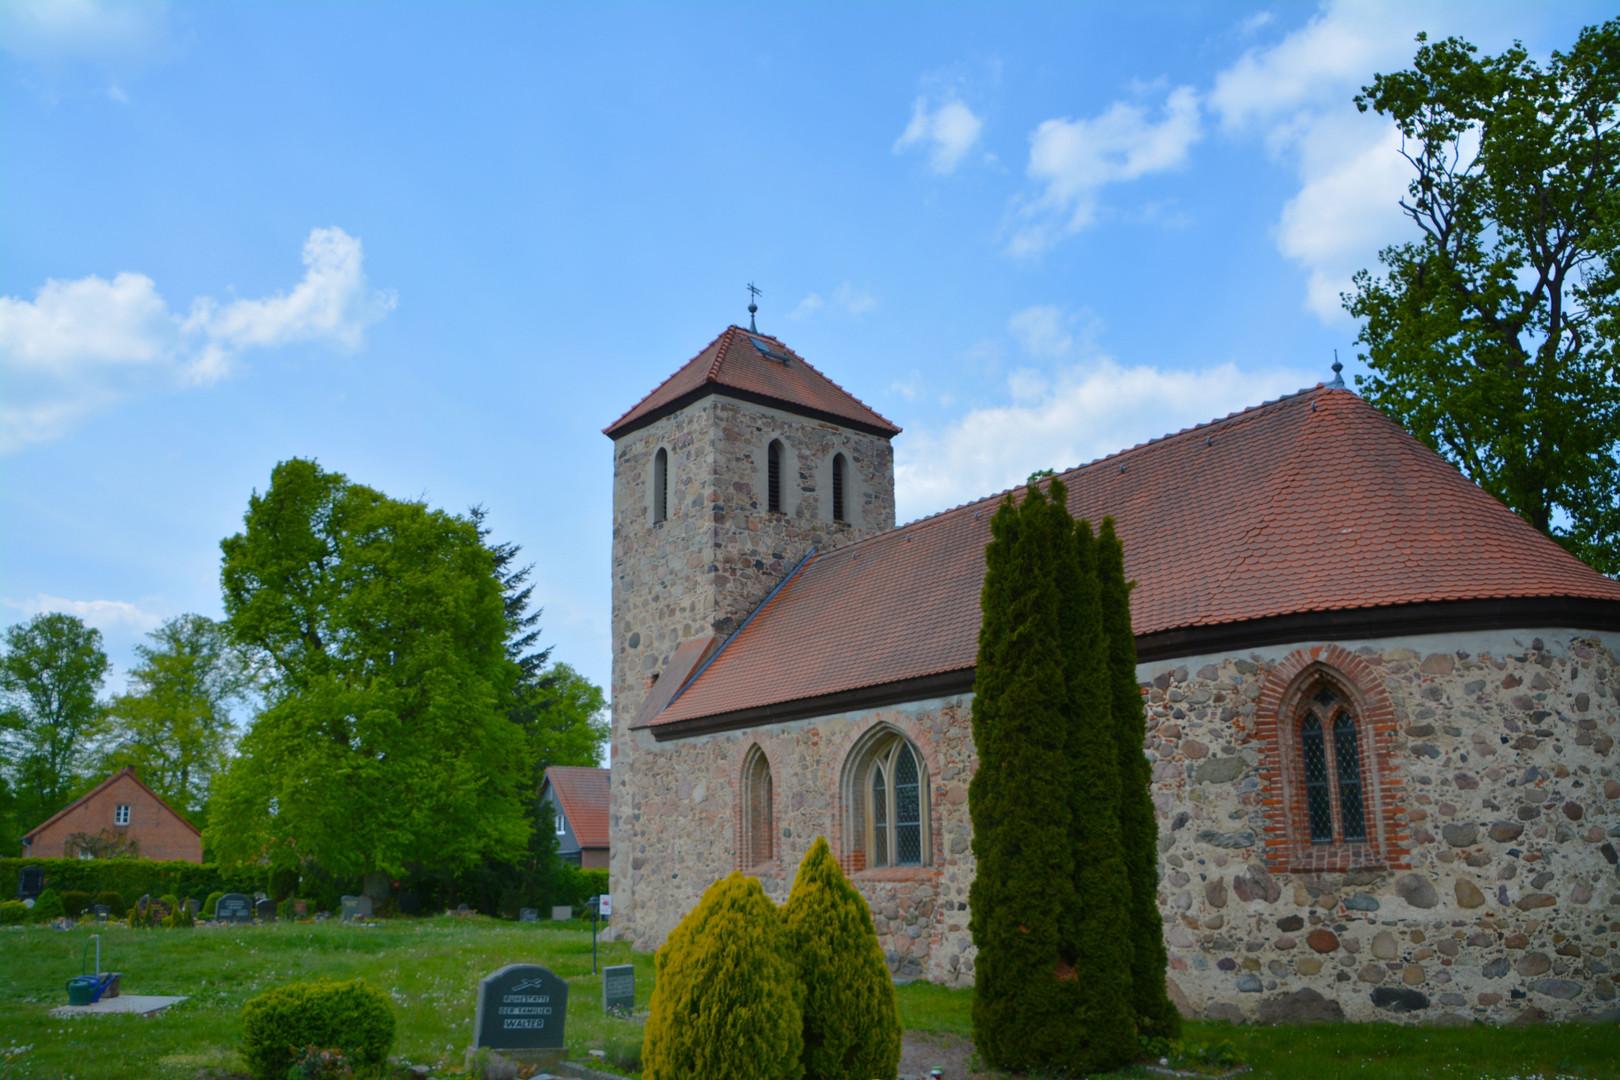 Dorfkirche Wilkendorf